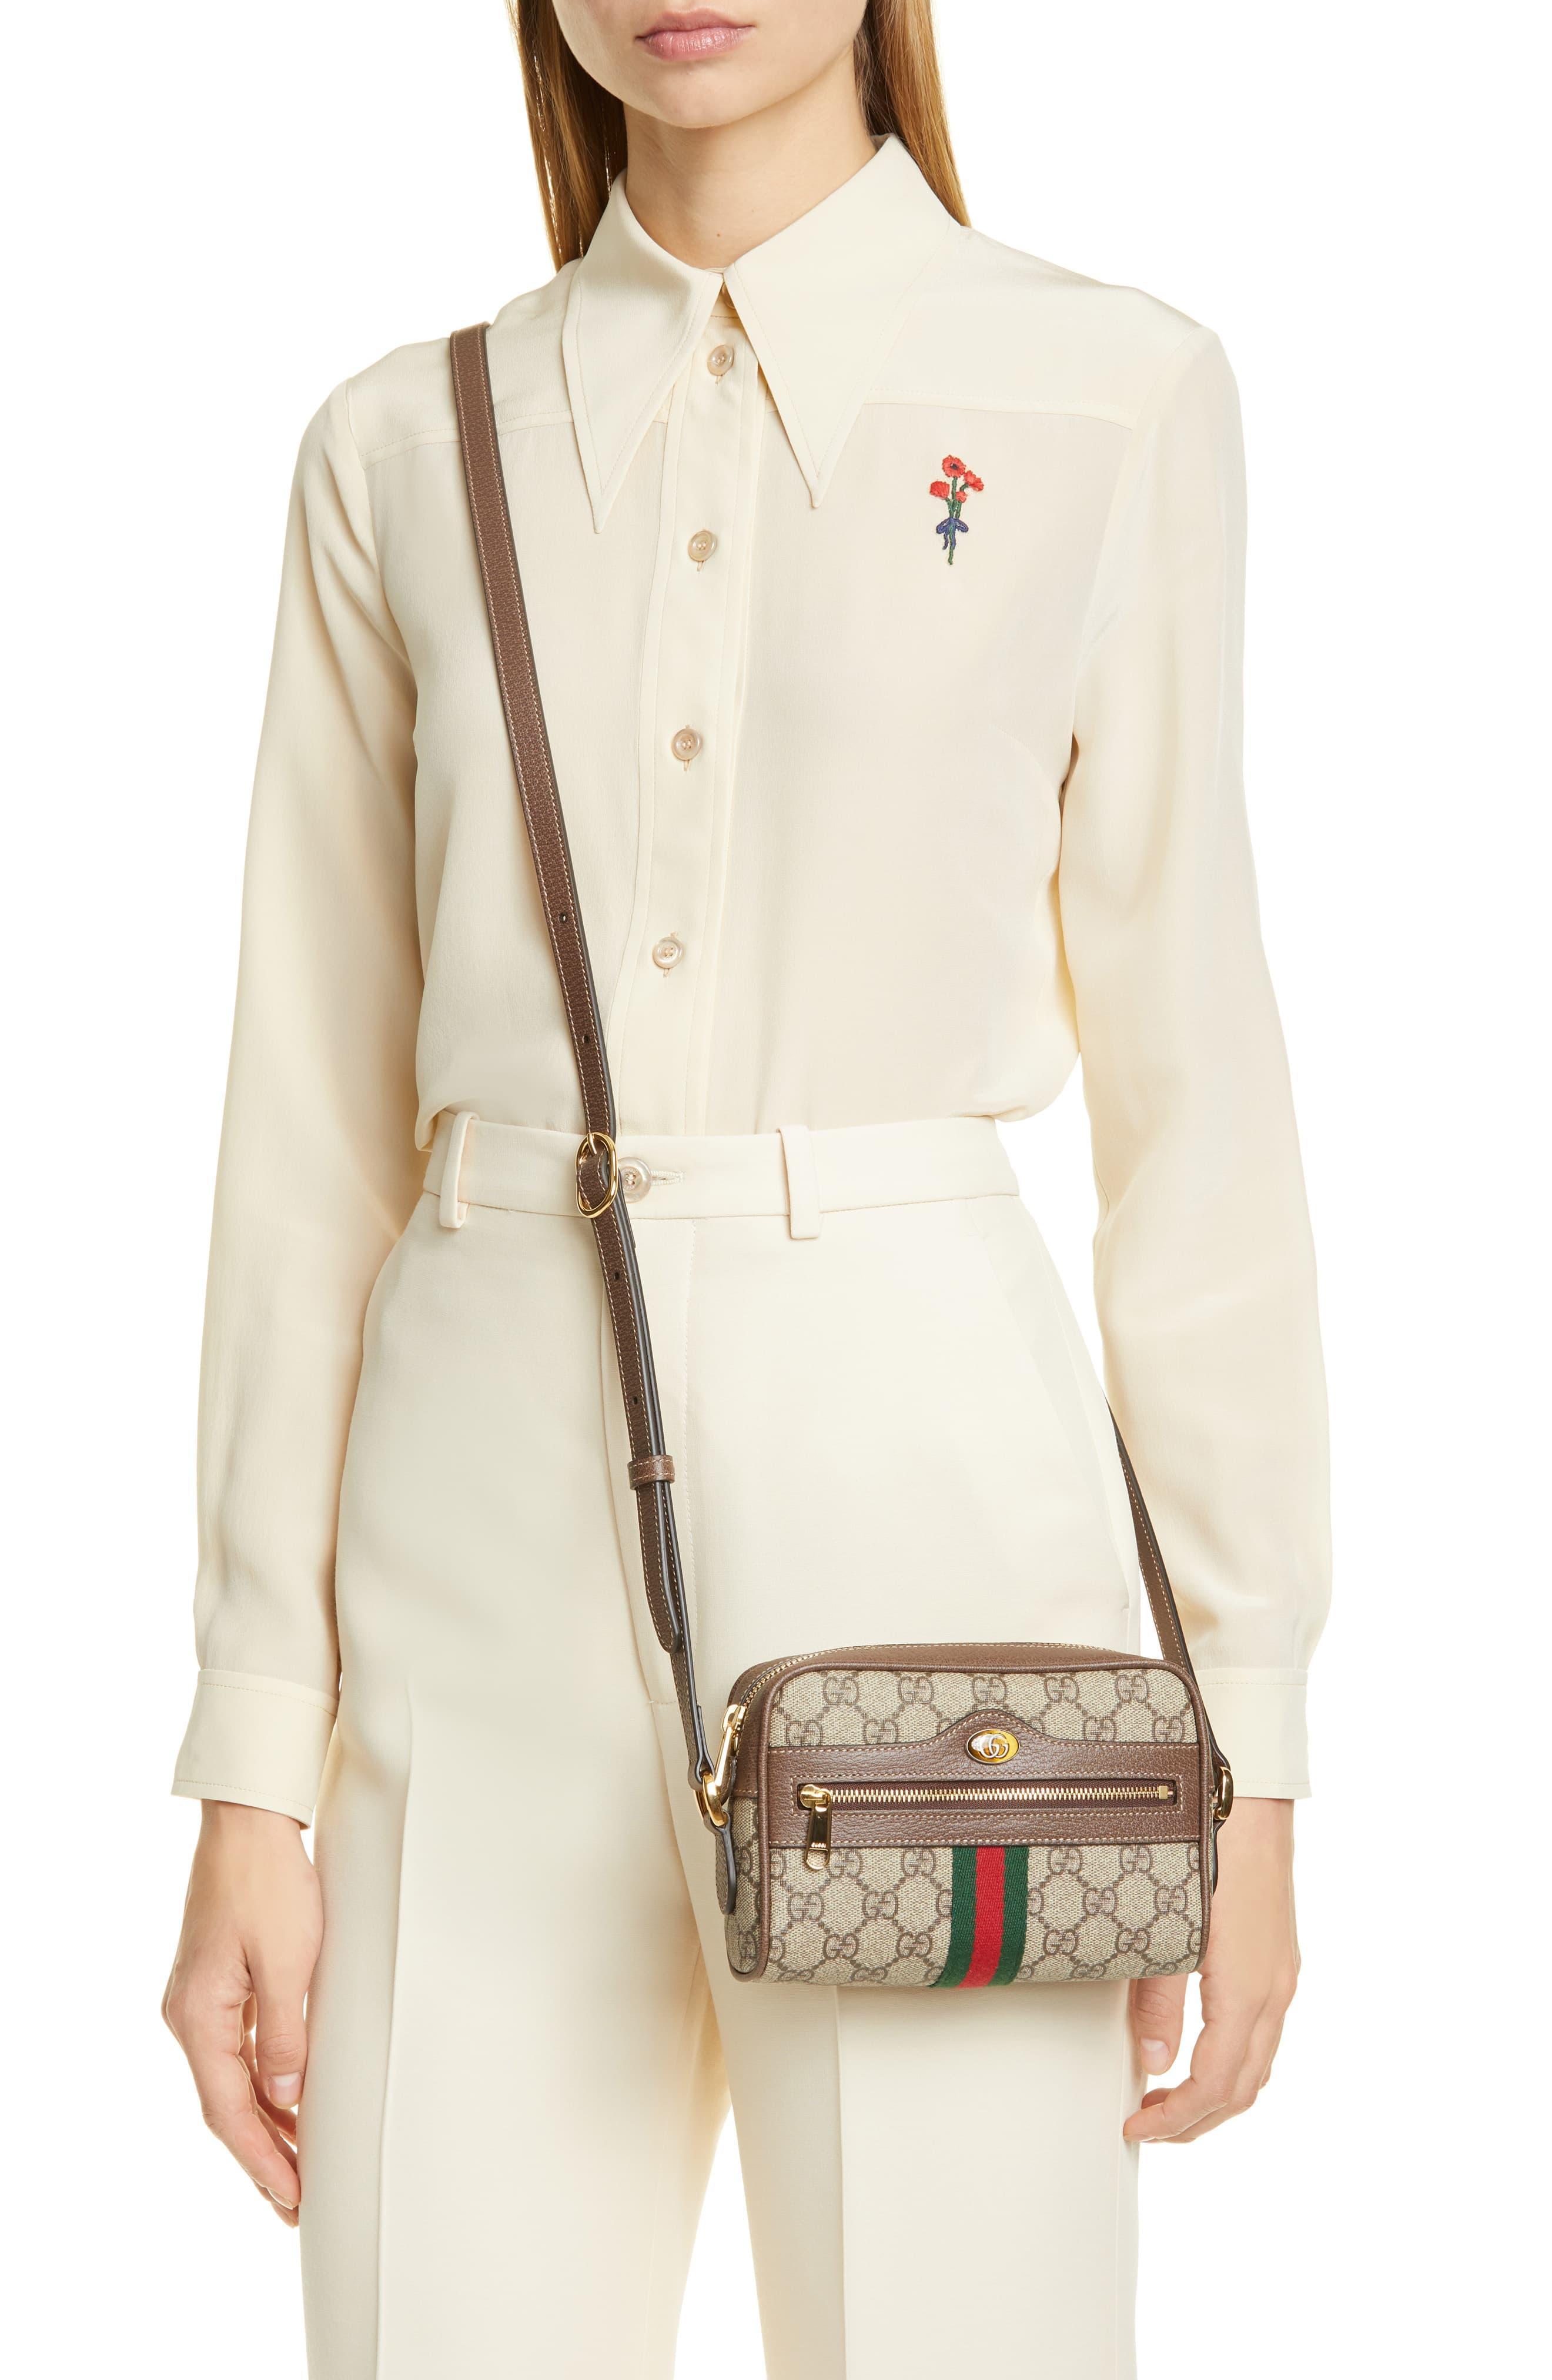 80a439ff45d1 Gucci - Natural Ophidia GG Supreme Mini Bag - Lyst. View fullscreen